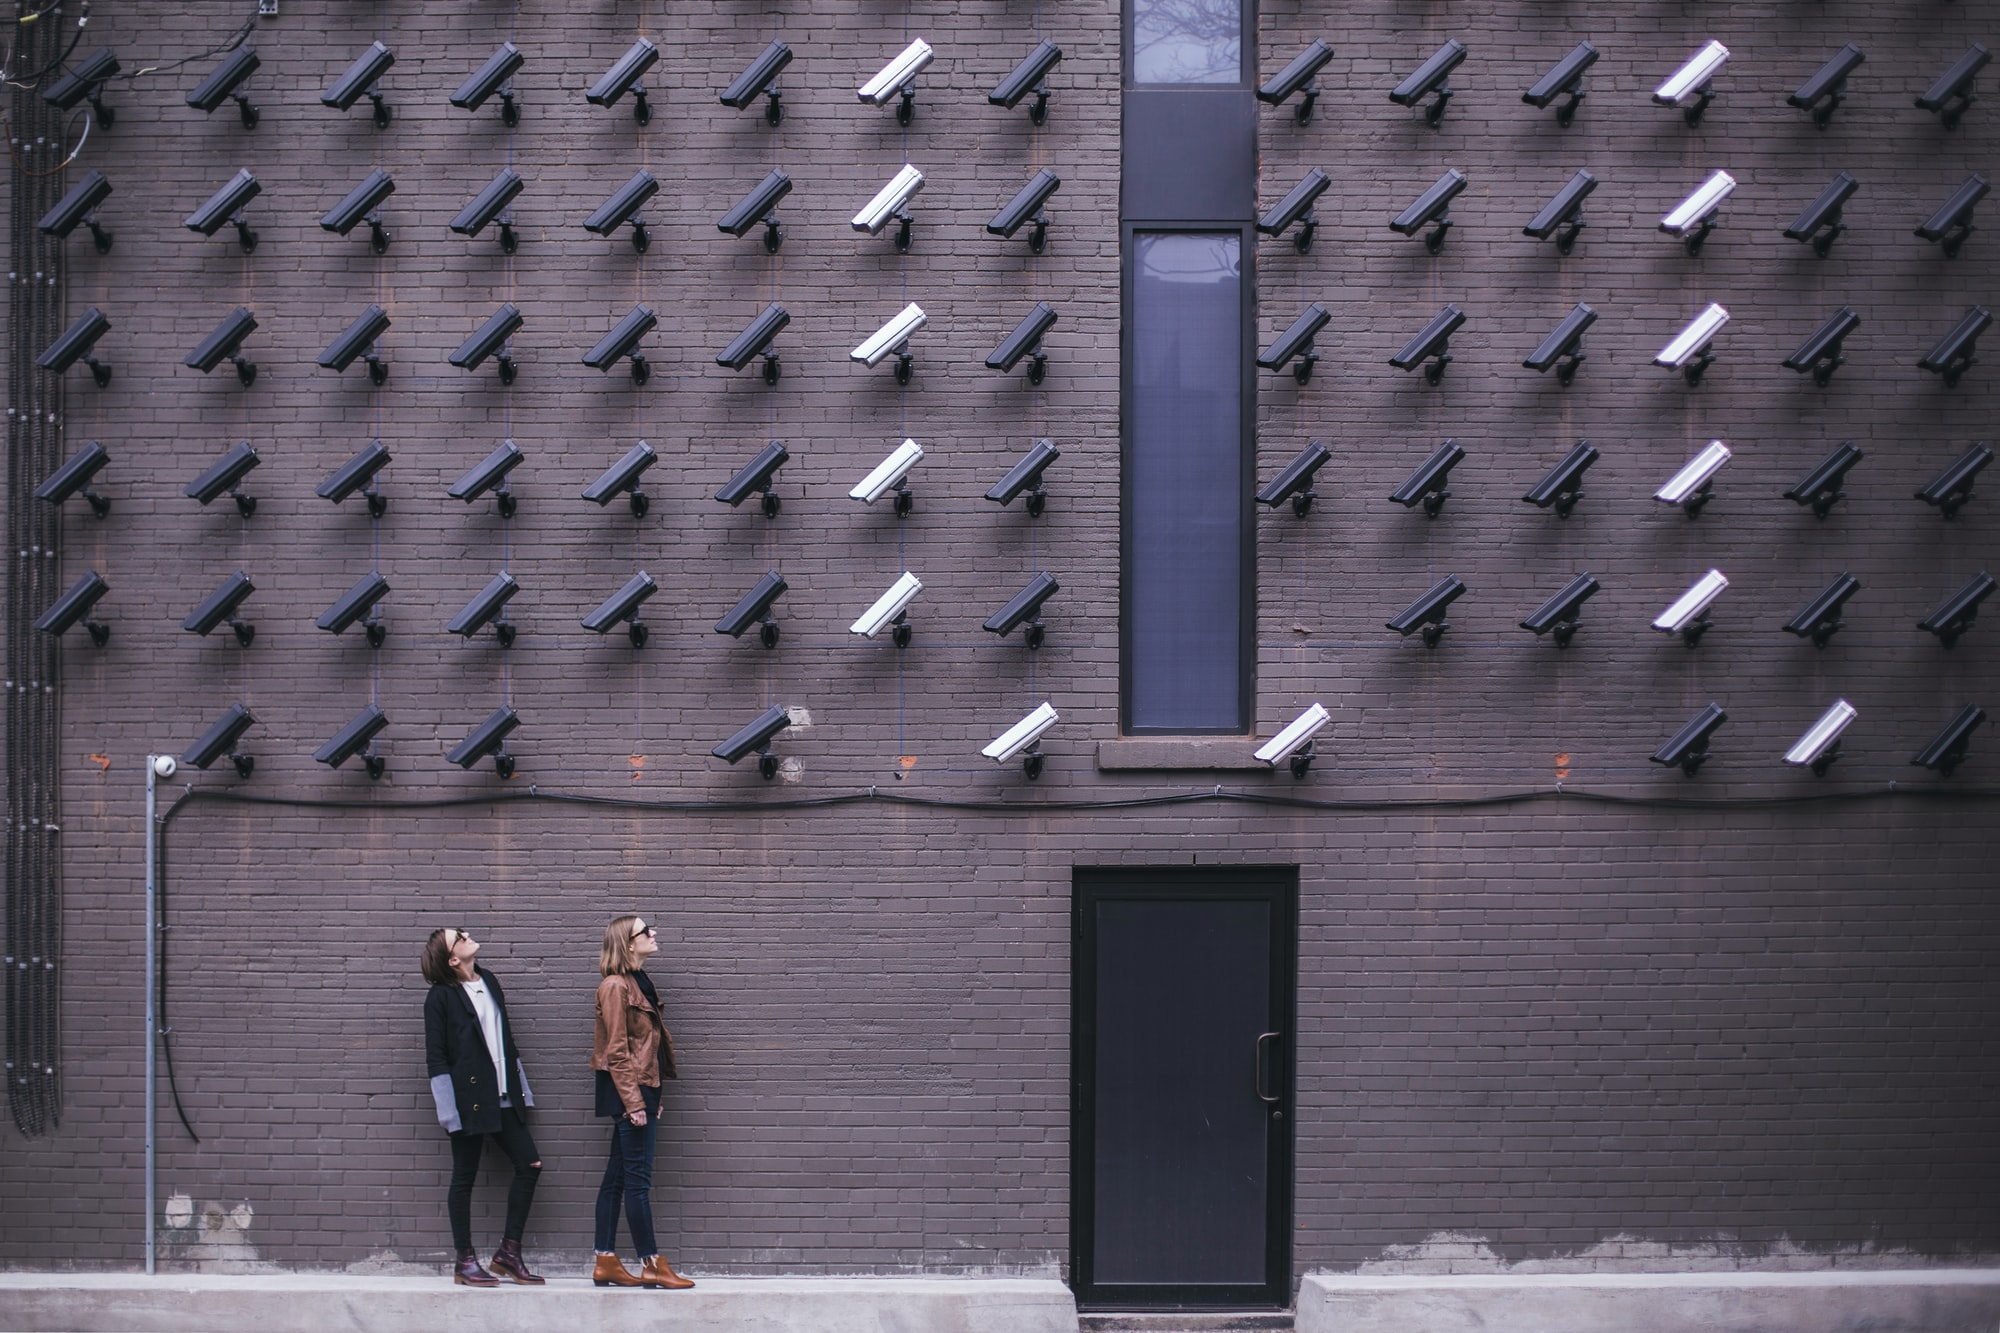 Women look at security cameras